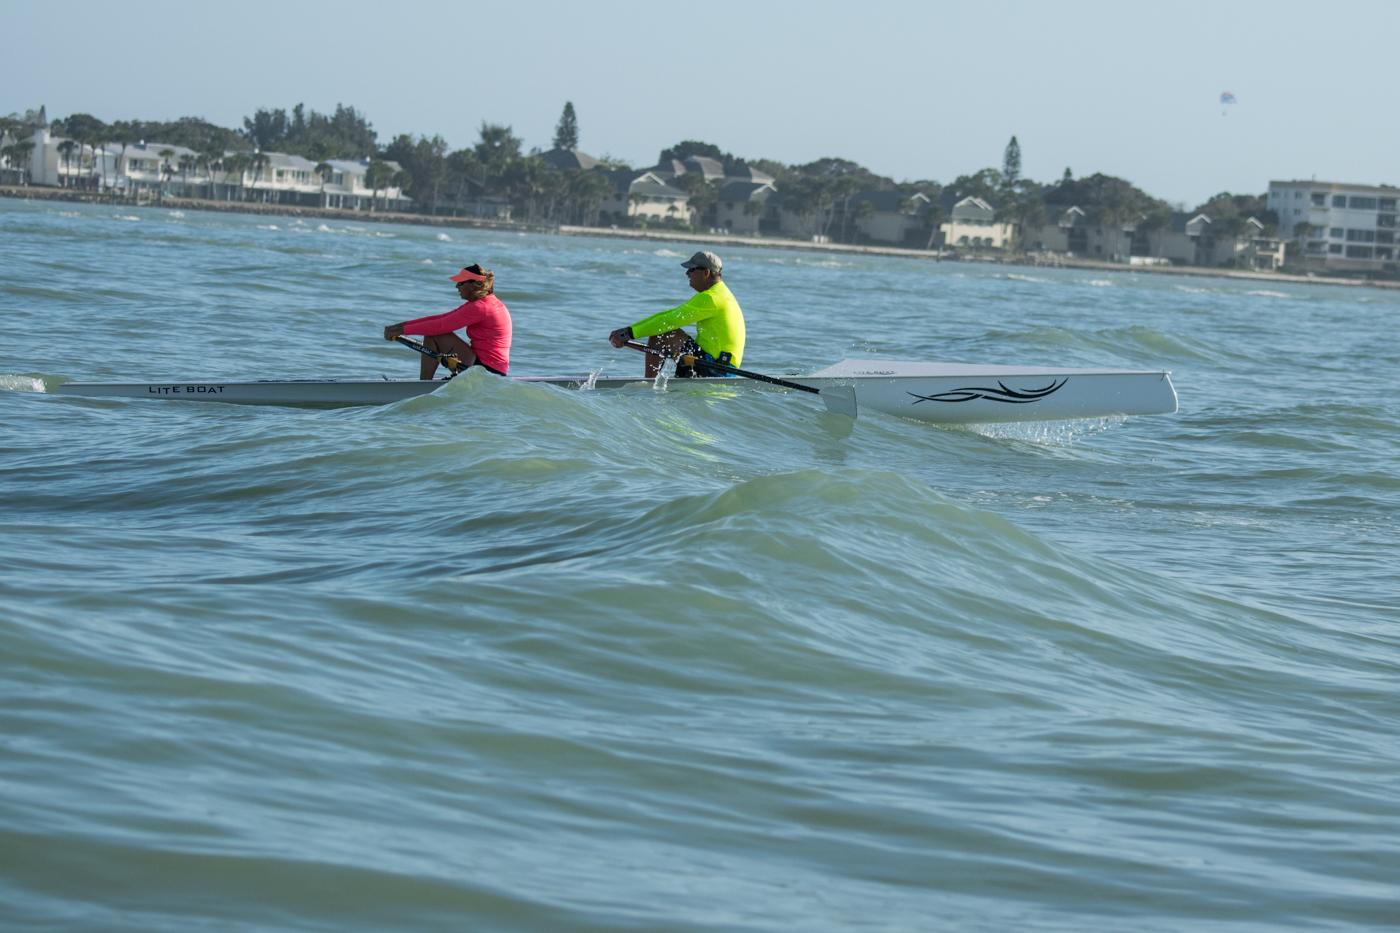 rowing_double-7.jpg